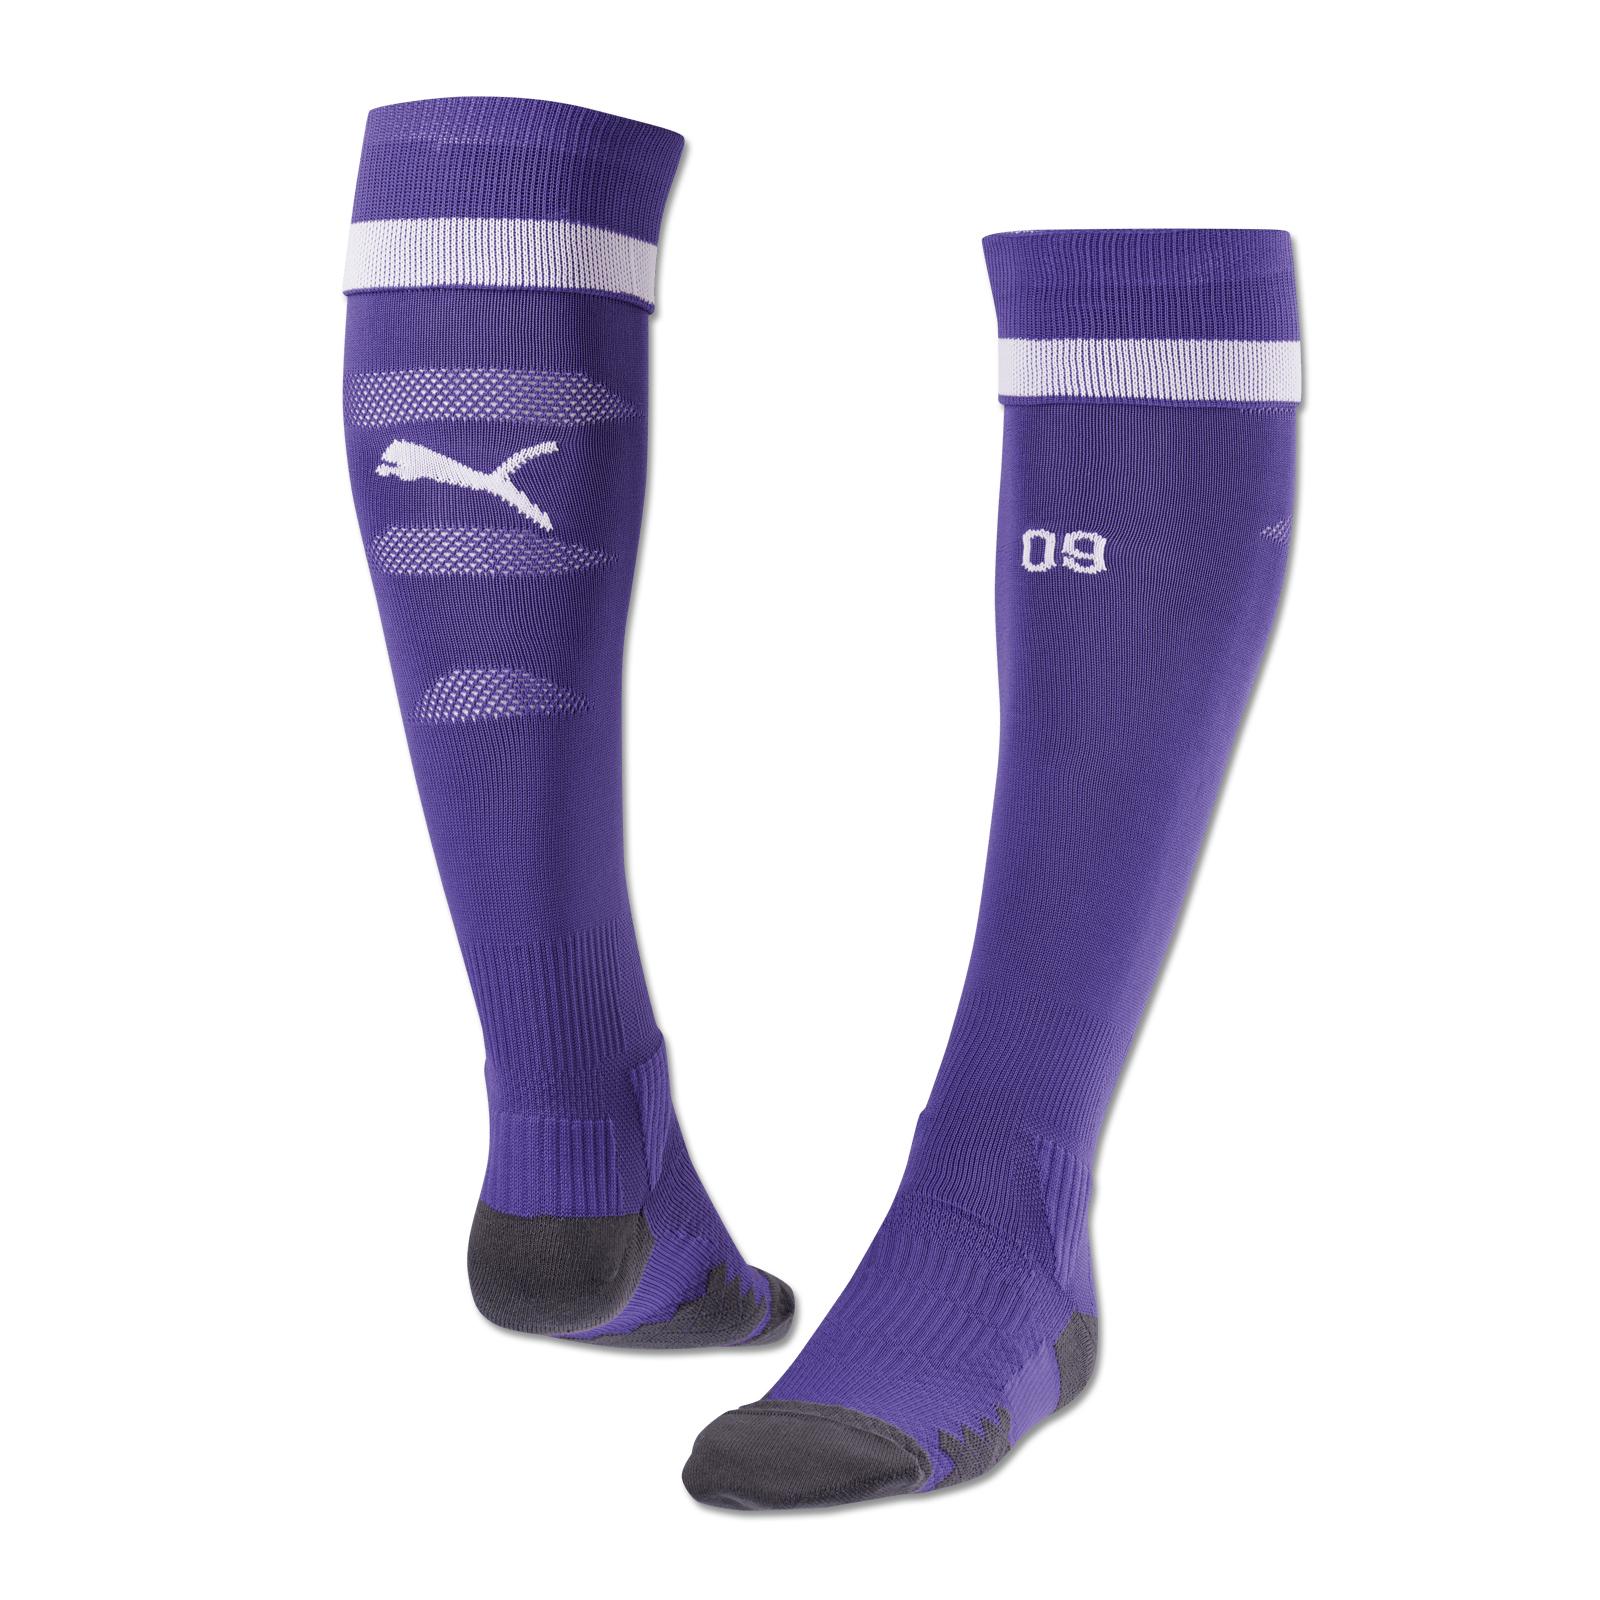 bvb stutzen 18 19 violett trikots co herren offizieller bvb online fanshop. Black Bedroom Furniture Sets. Home Design Ideas